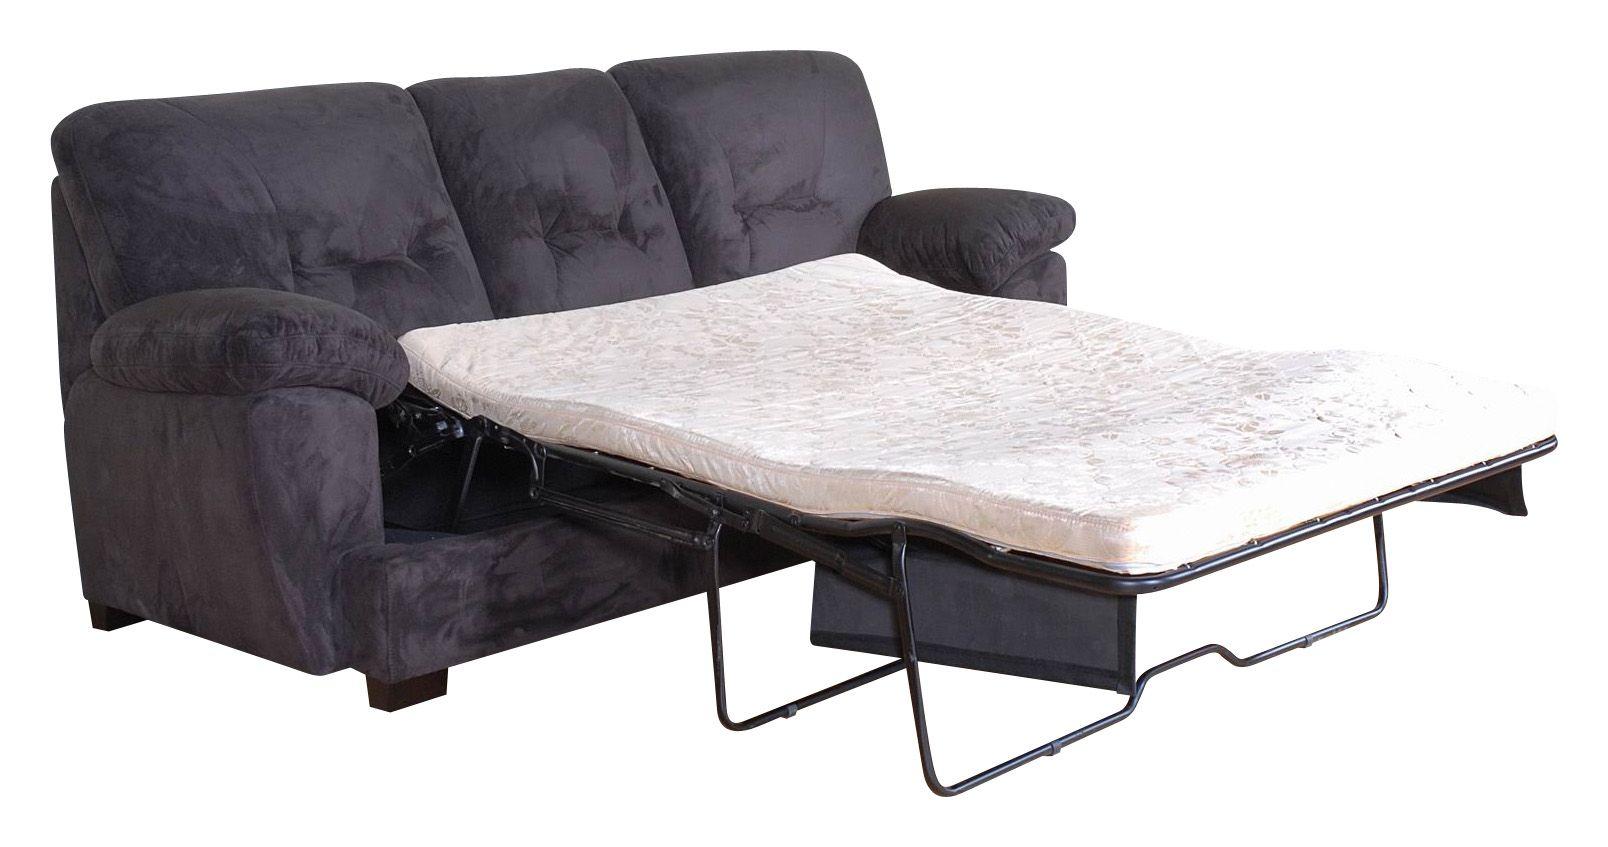 Sleeper Sofa With Air Mattress Image Gallery